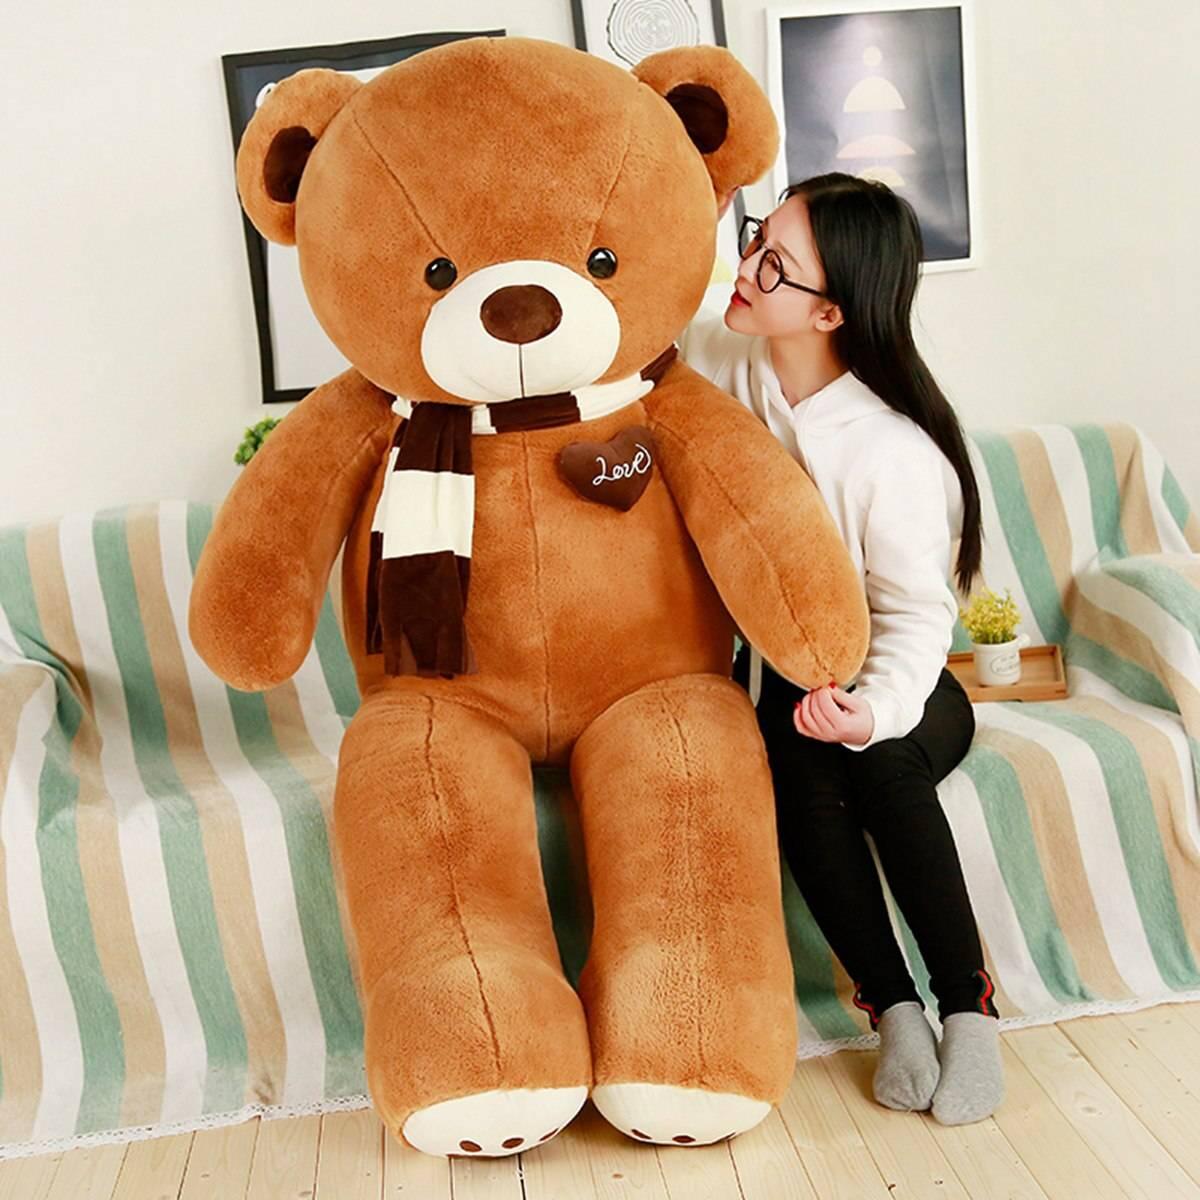 Teddy Bear Plush Toys Stuffed Animals Soft Big Heart Bear Yesbear Pillow Birhday Valentines Day Gifts For Girls Kid